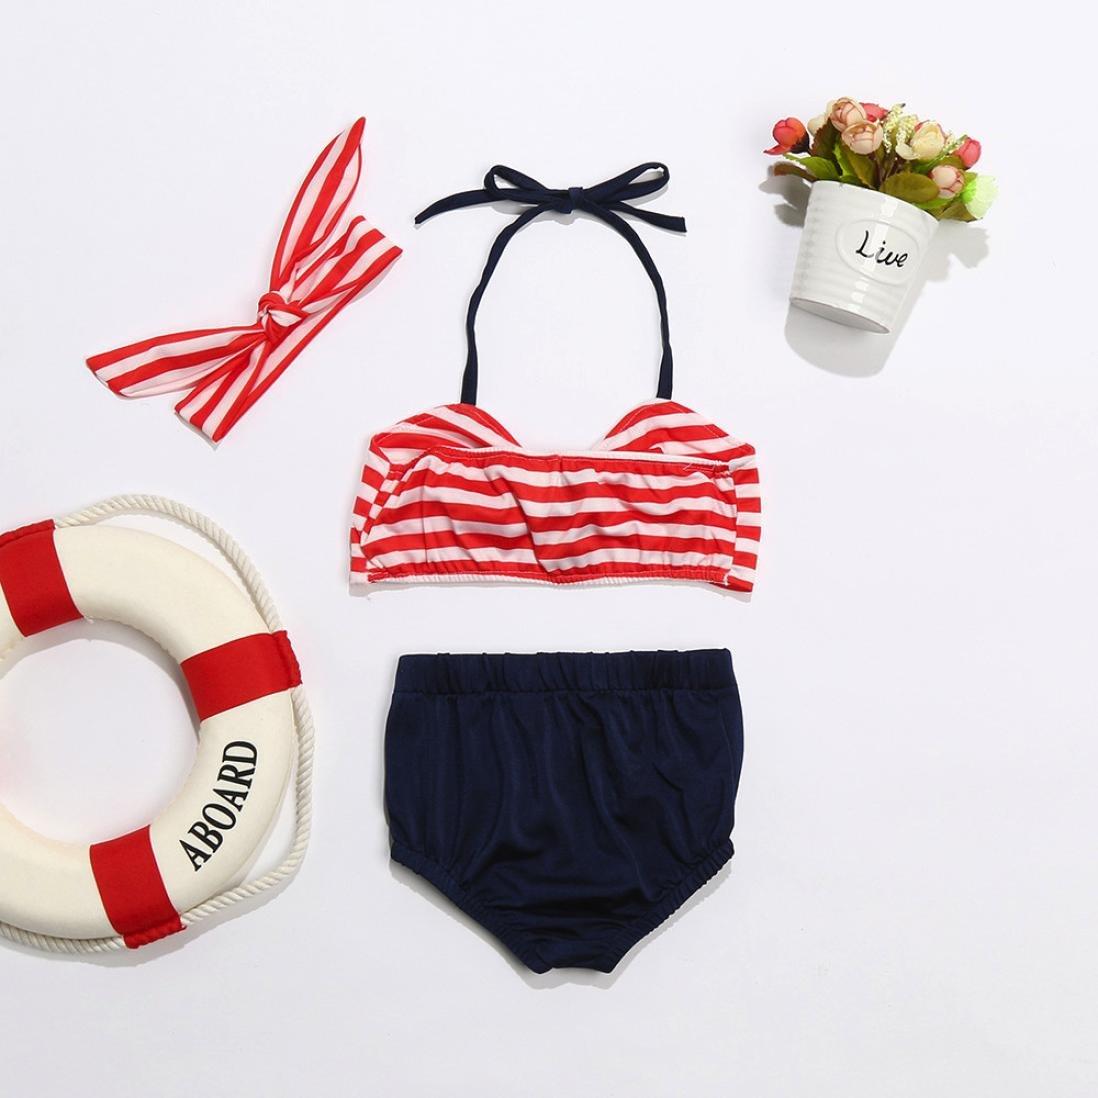 squarex 3Pcs Kids Baby Girls Swimwear Straps Swimsuit Bathing Bikini Set Outfits